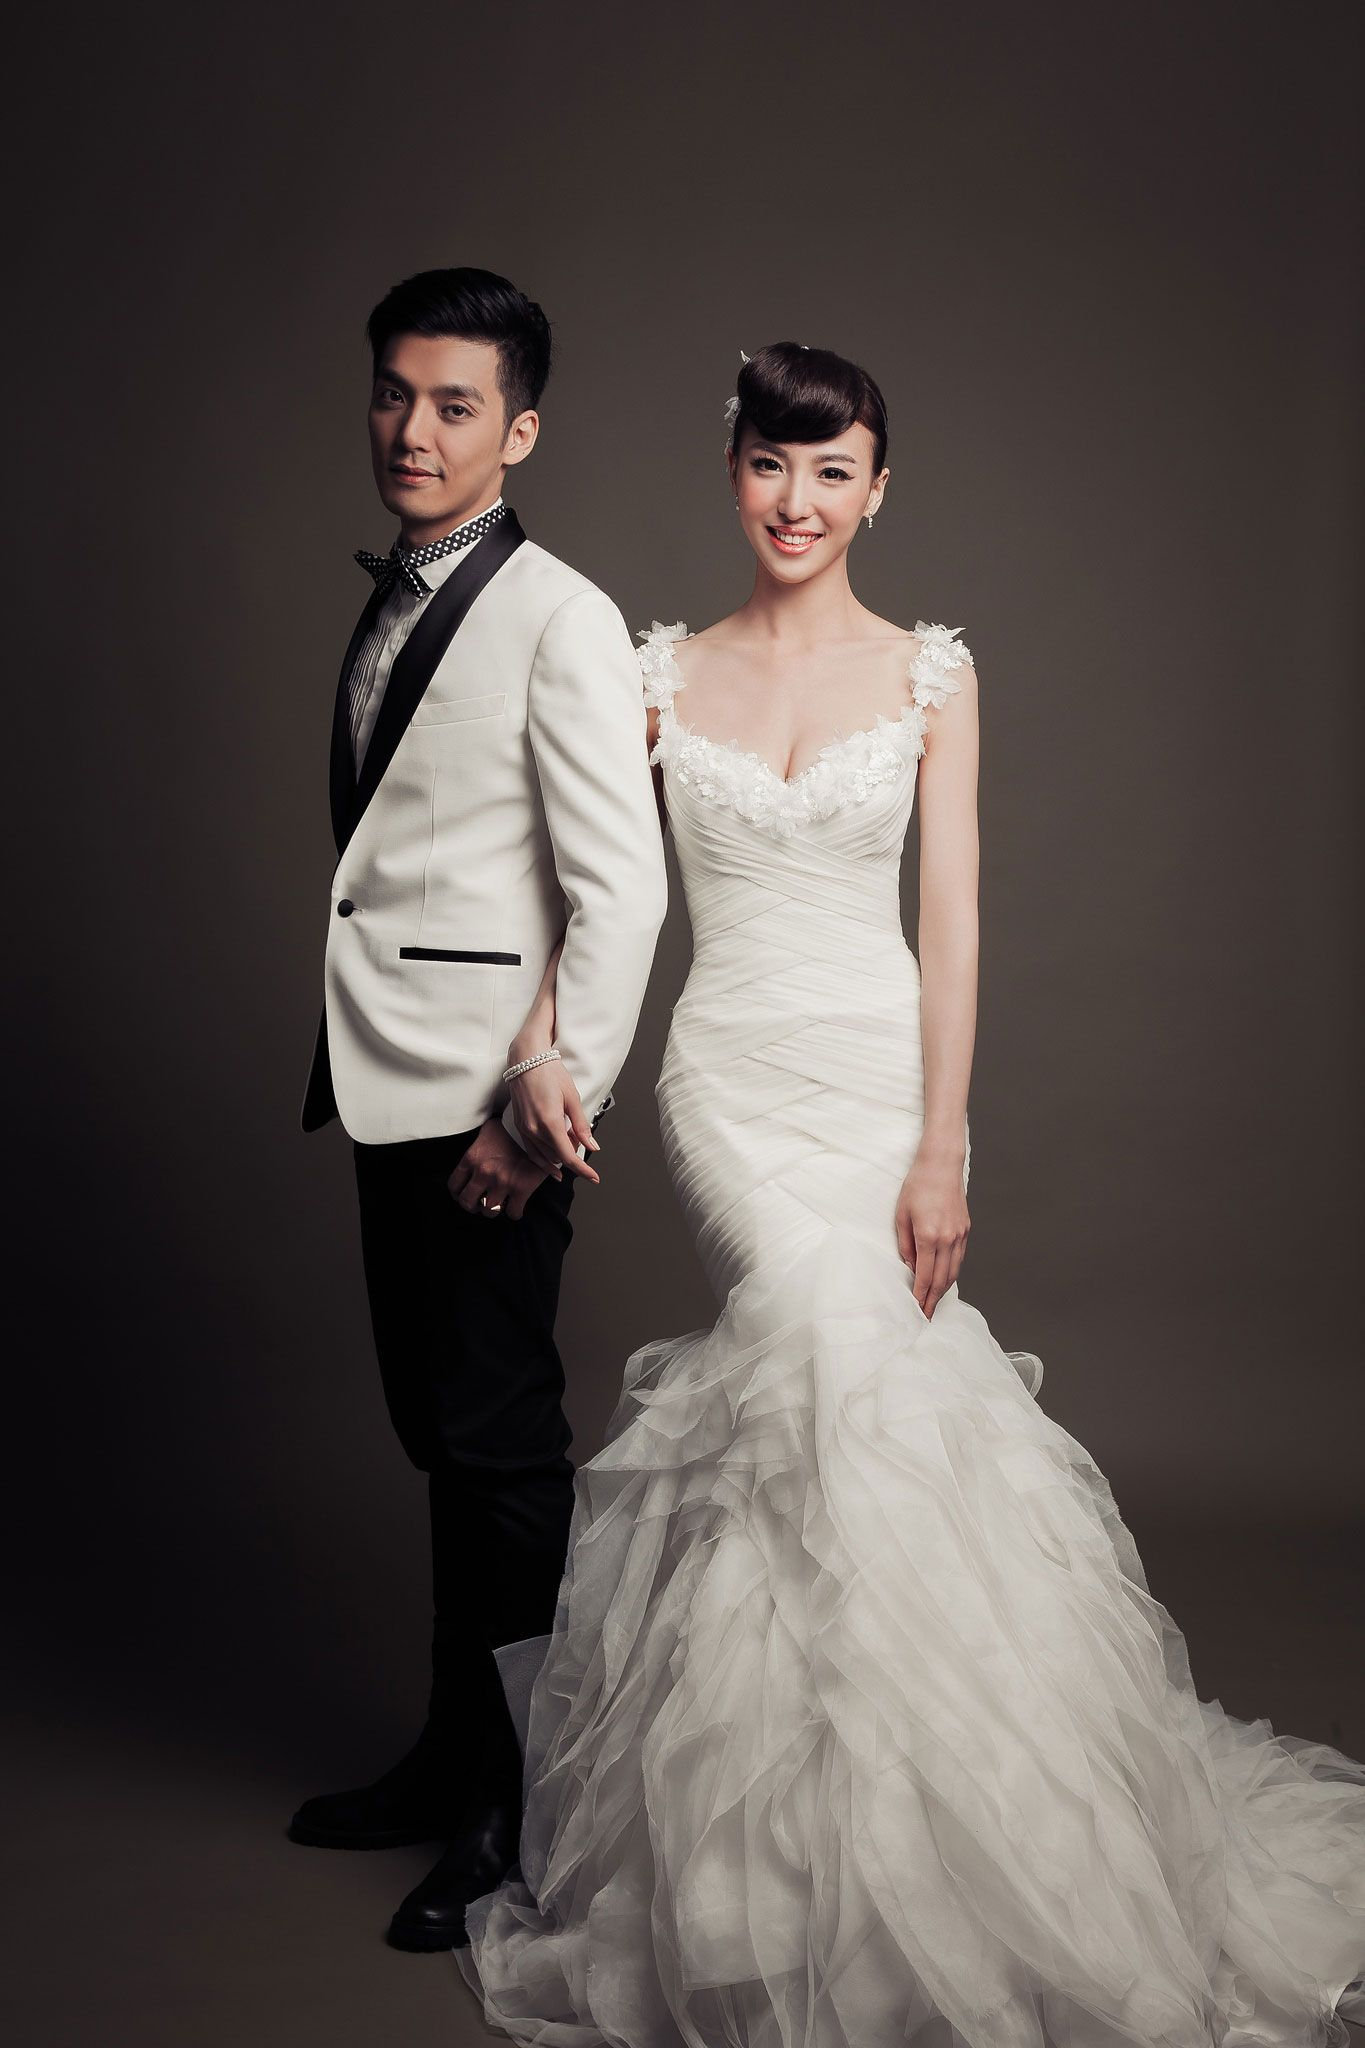 Sweet And Simple Studio Shot Pre Wedding Photoshoot By Mosquitoyao Photography Onethreeonefour